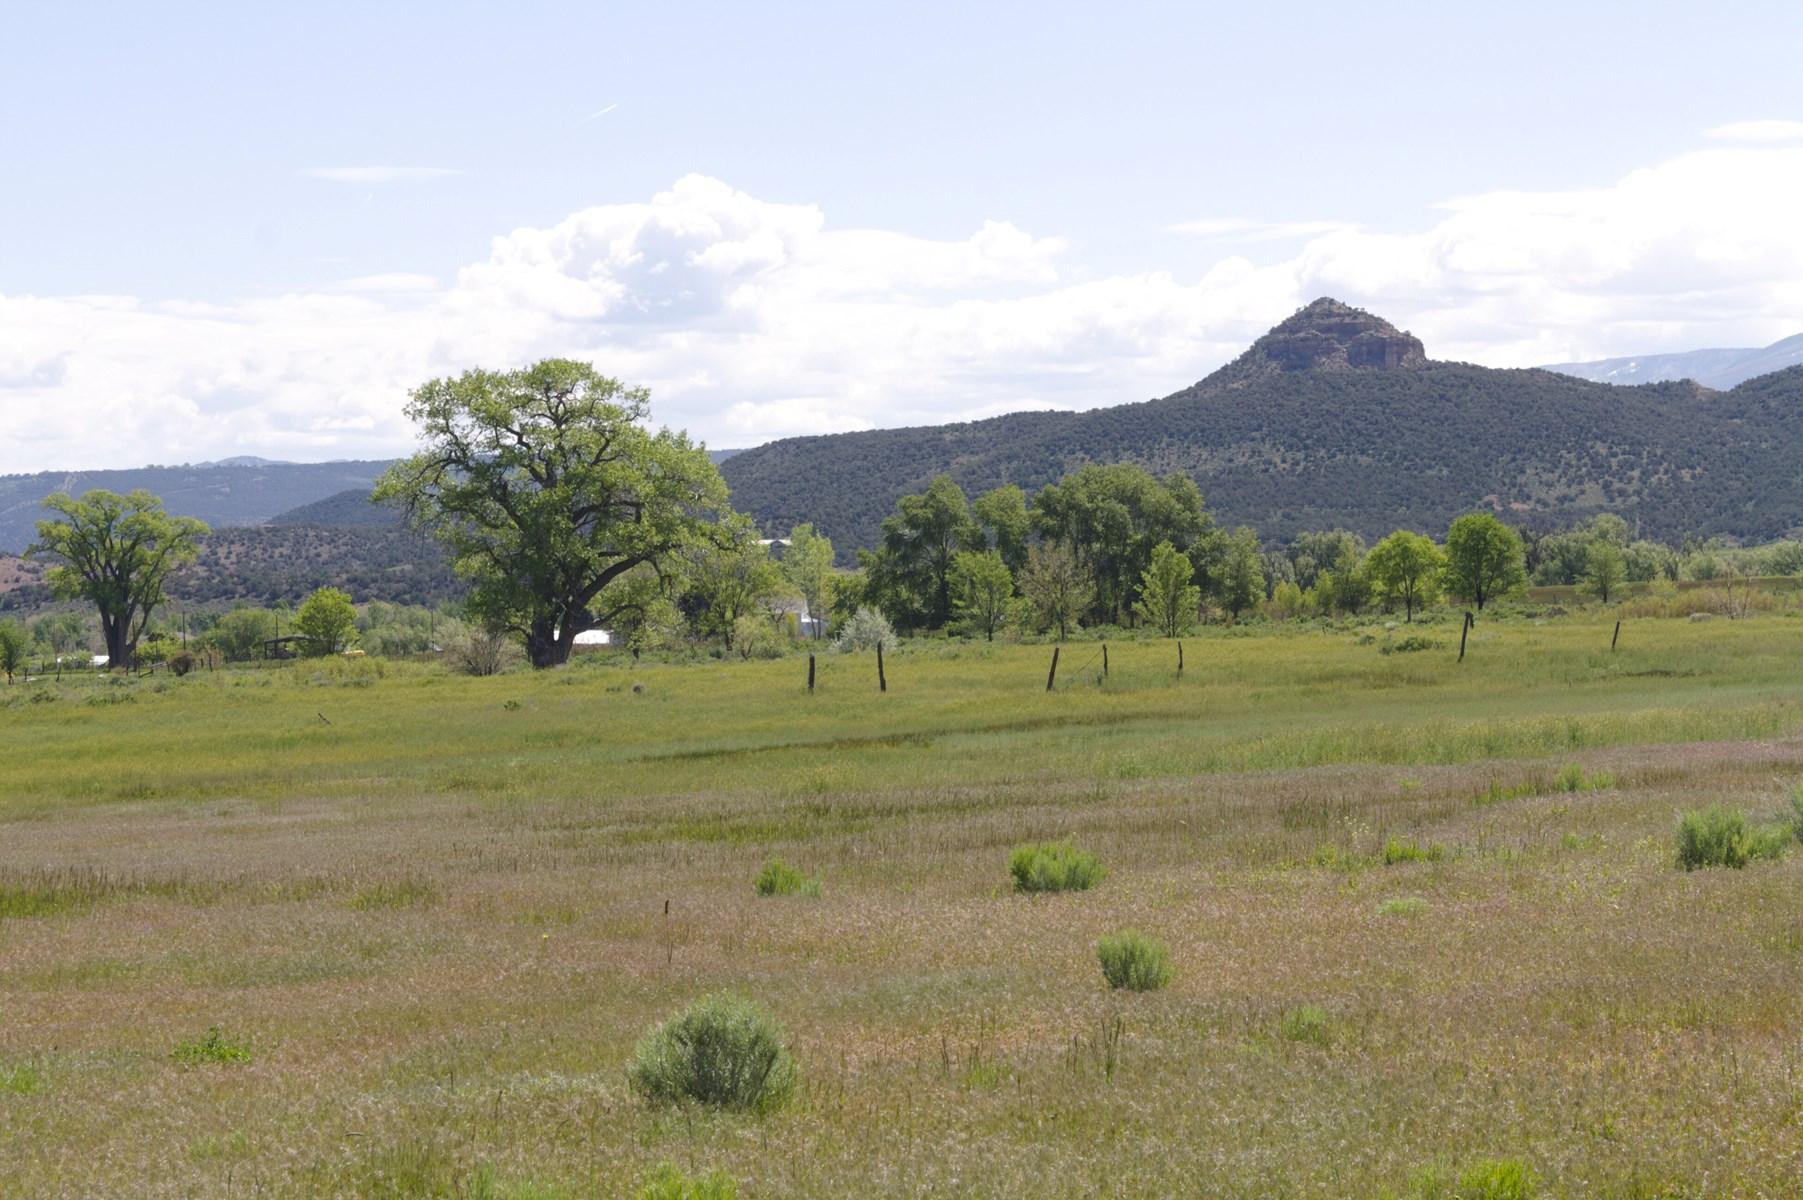 Colorado Mountain Development Land for Sale